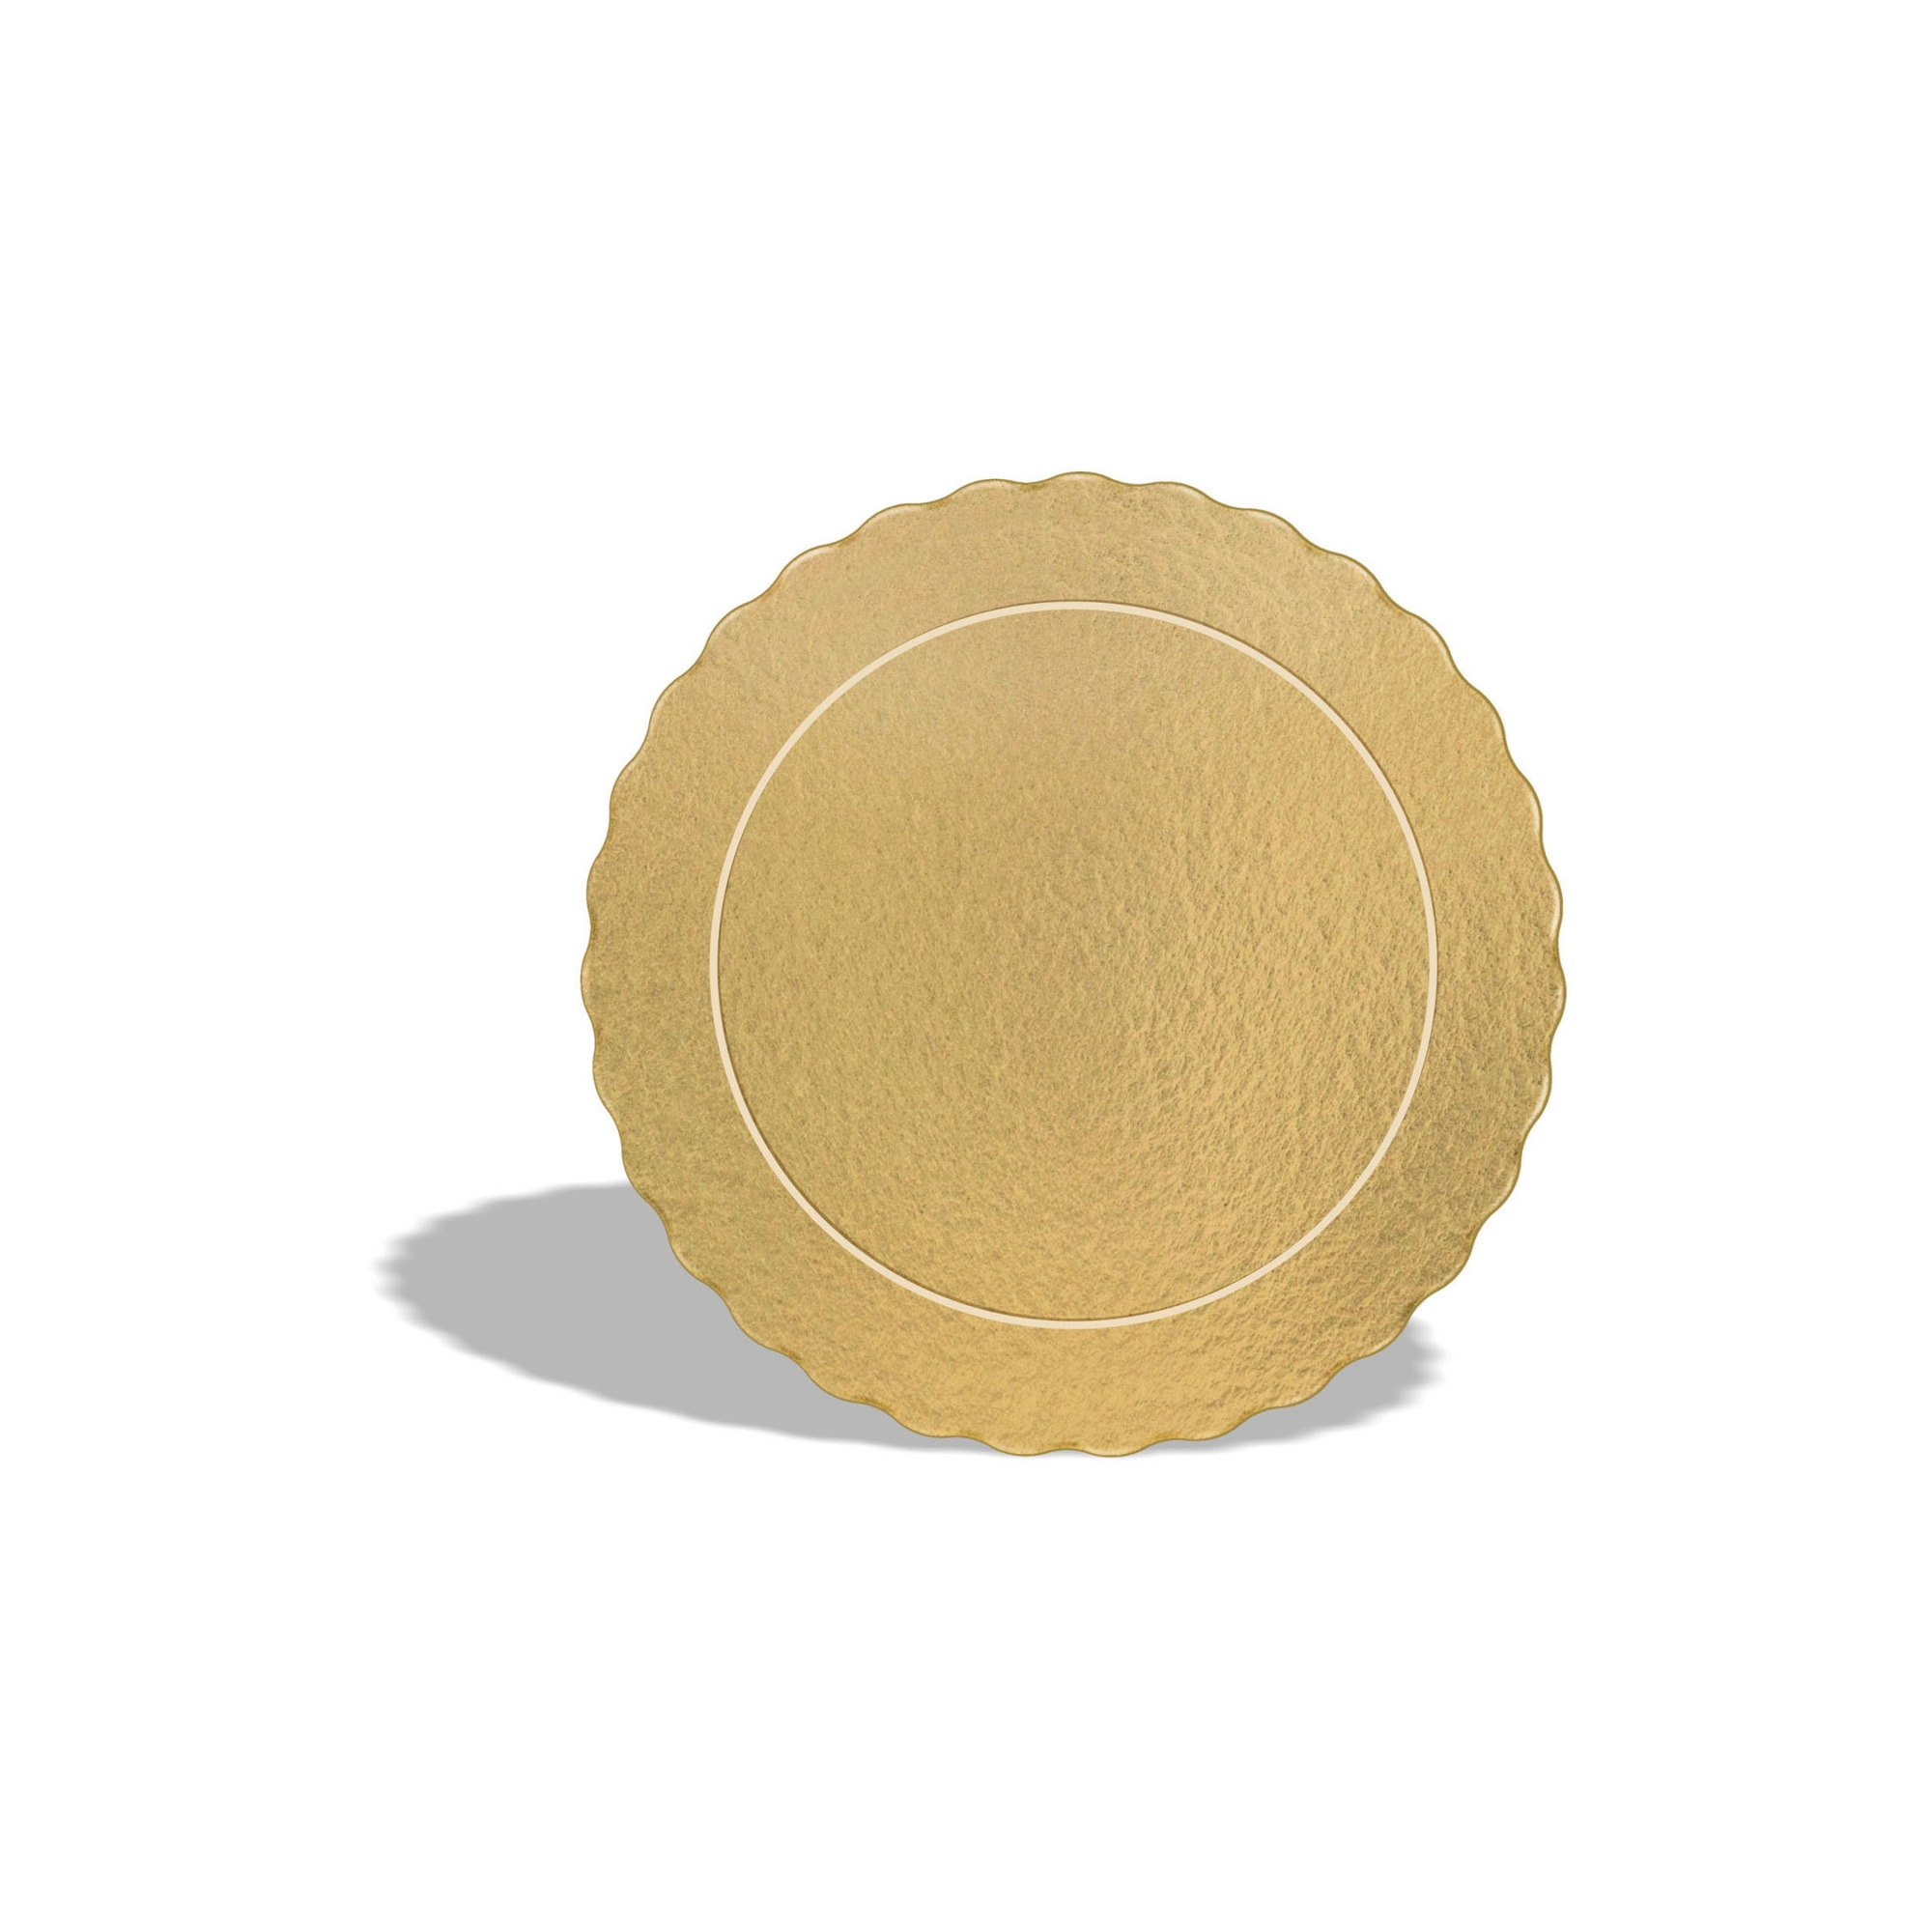 100 Bases Laminadas, Suporte P/ Bolo, Cake Board, 12cm - Ouro